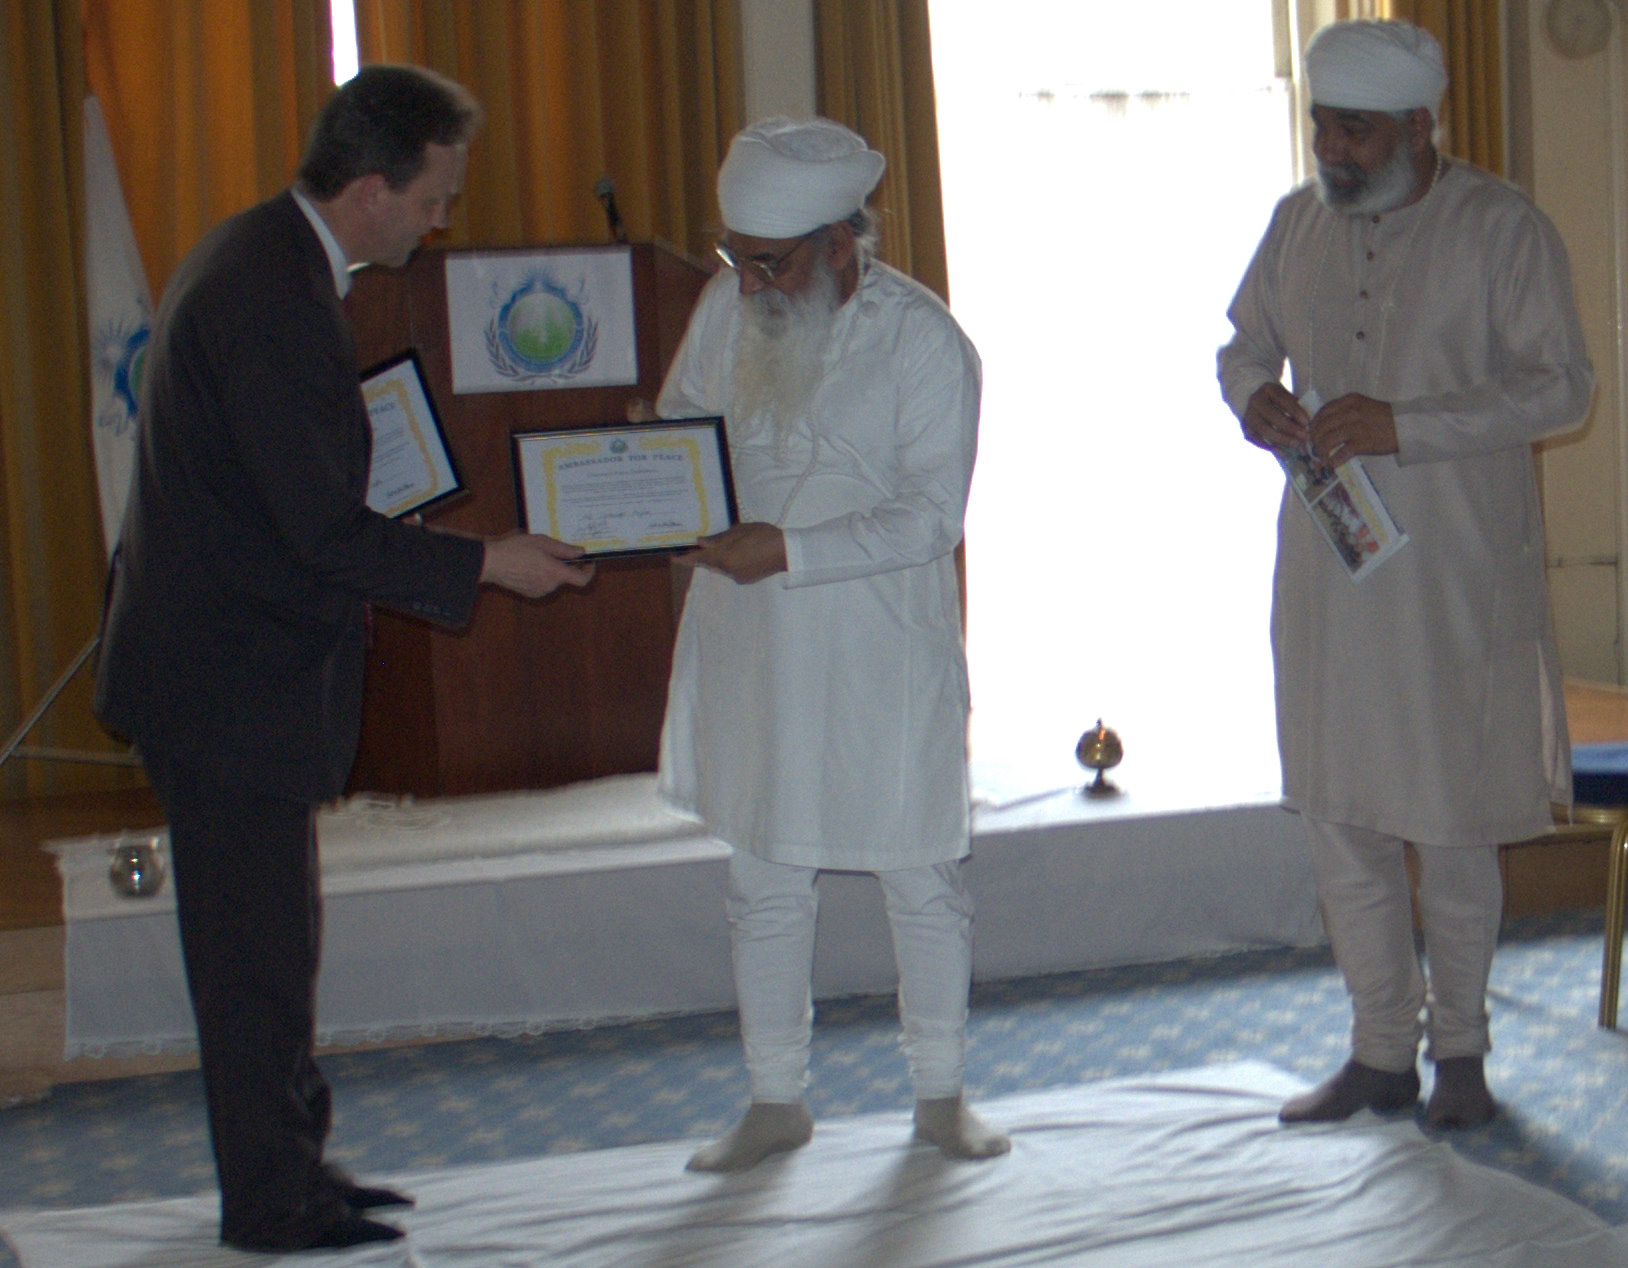 Presenting Sant Tehal Singh with an Ambassador for Peace Award